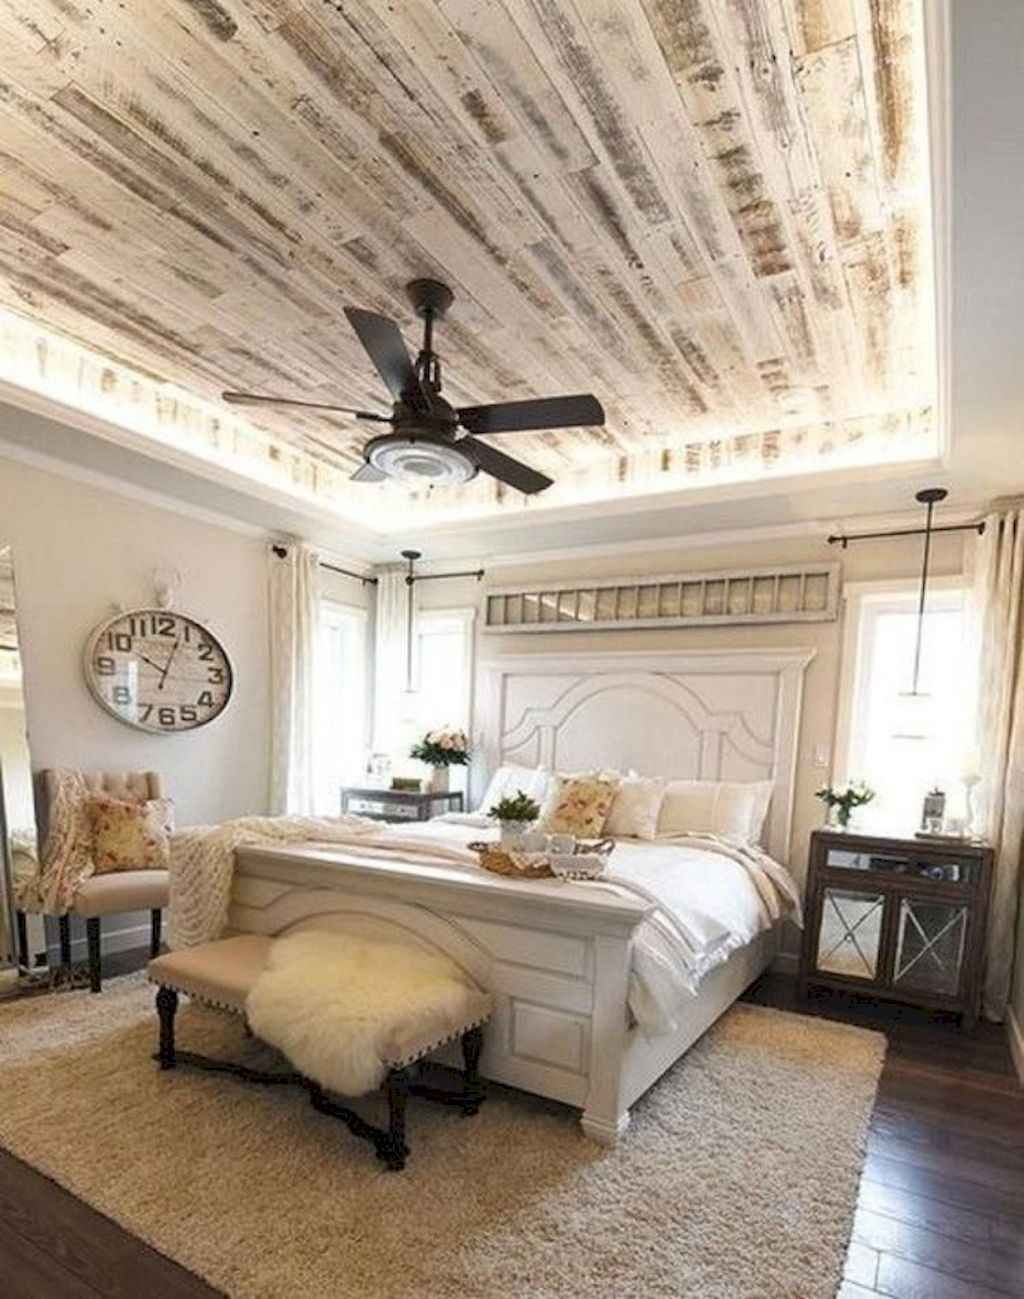 75 Farmhouse Master Bedroom Decorating Ideas Farmhouse Bedroom